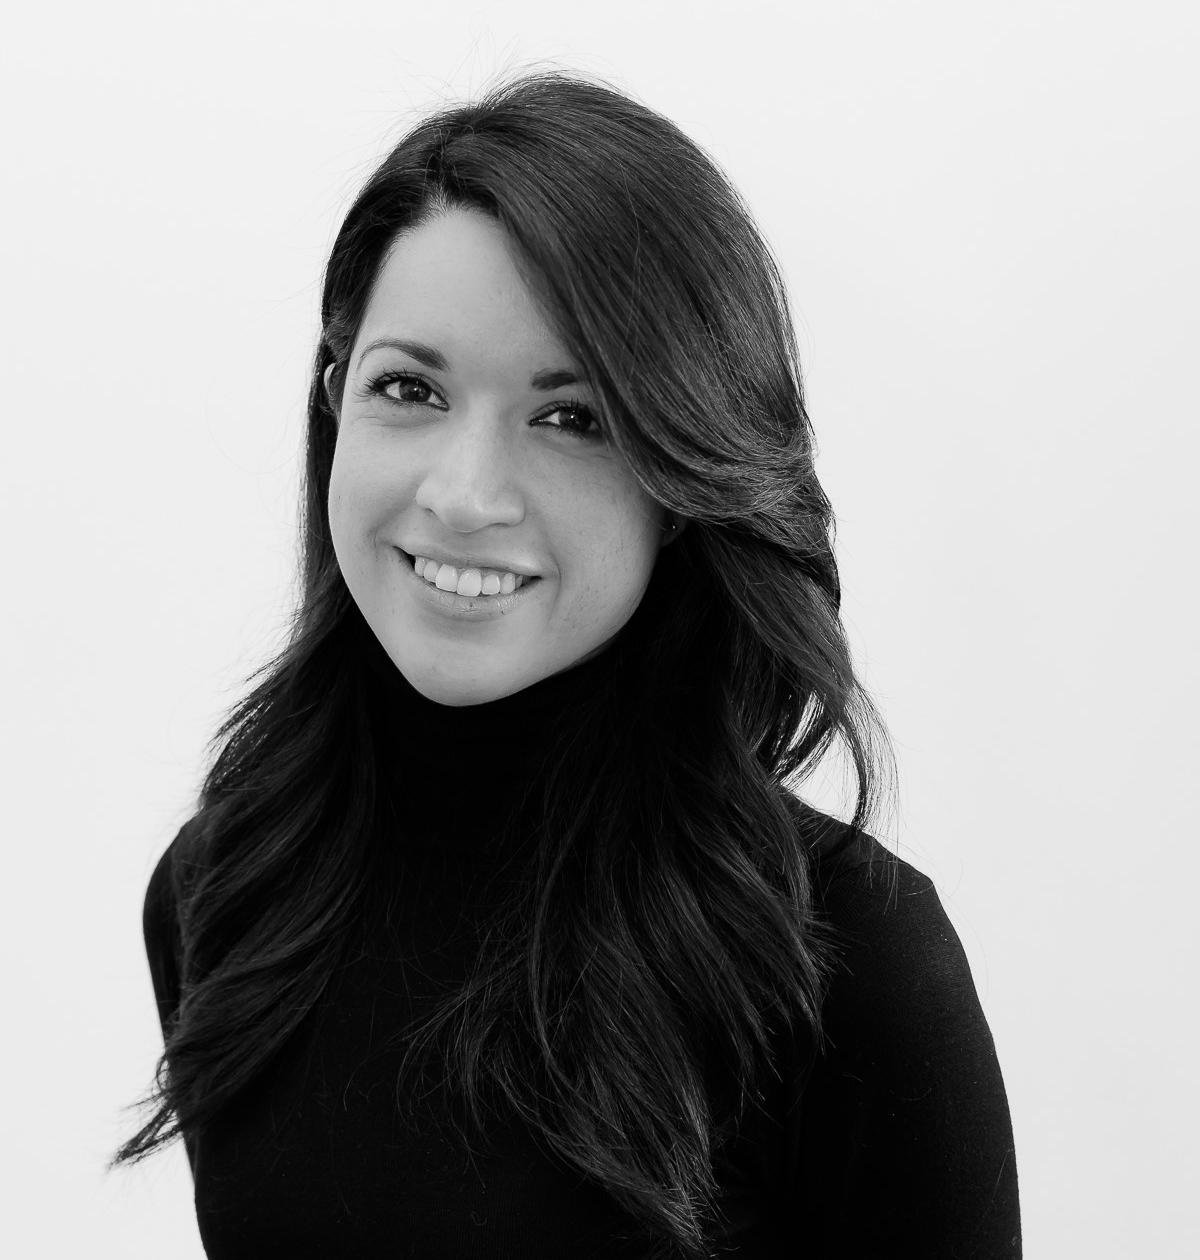 Angela Pedrozo